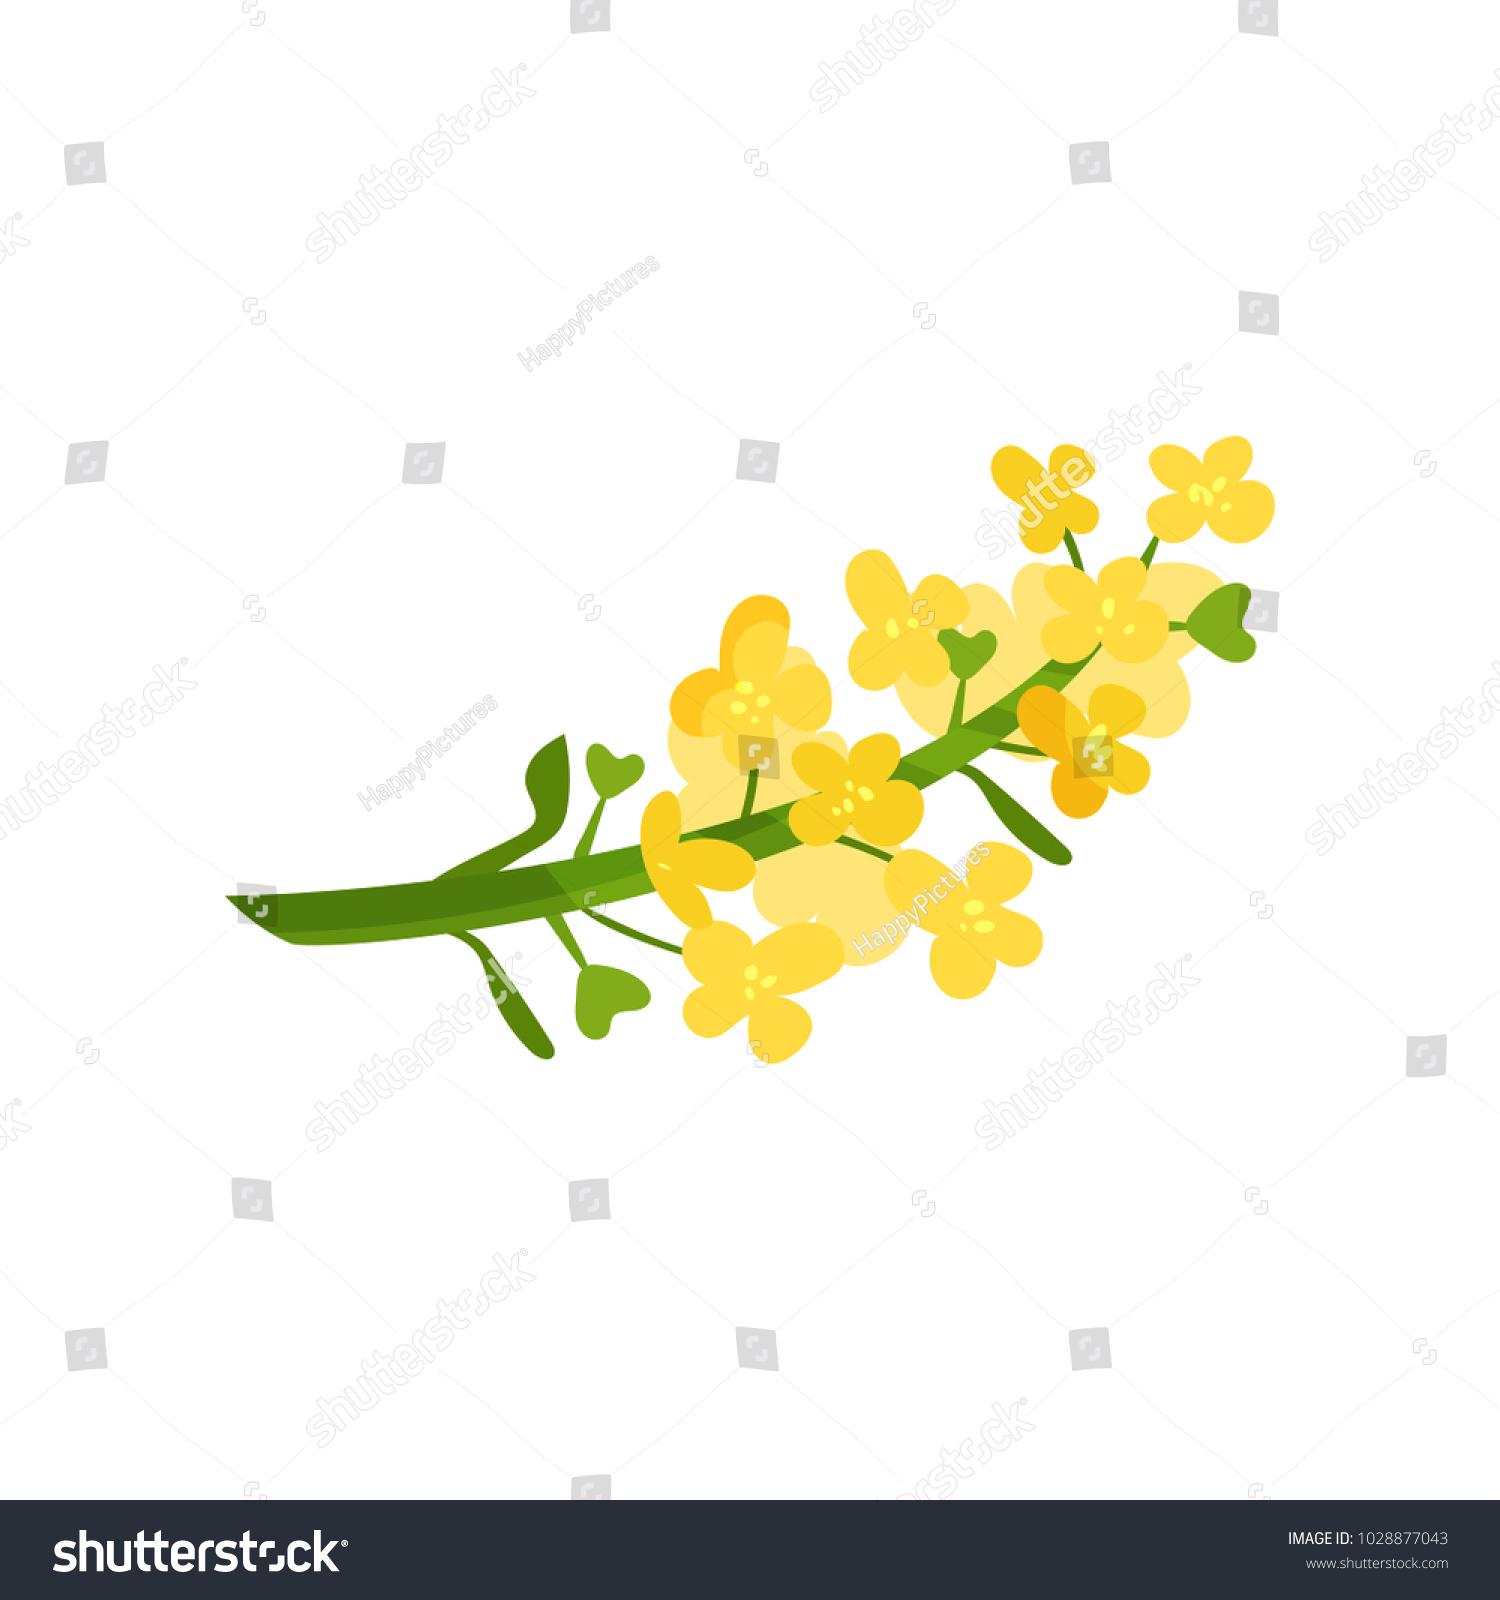 Cartoon Illustration Of Small Yellow Flowers On Green Stalk Wild